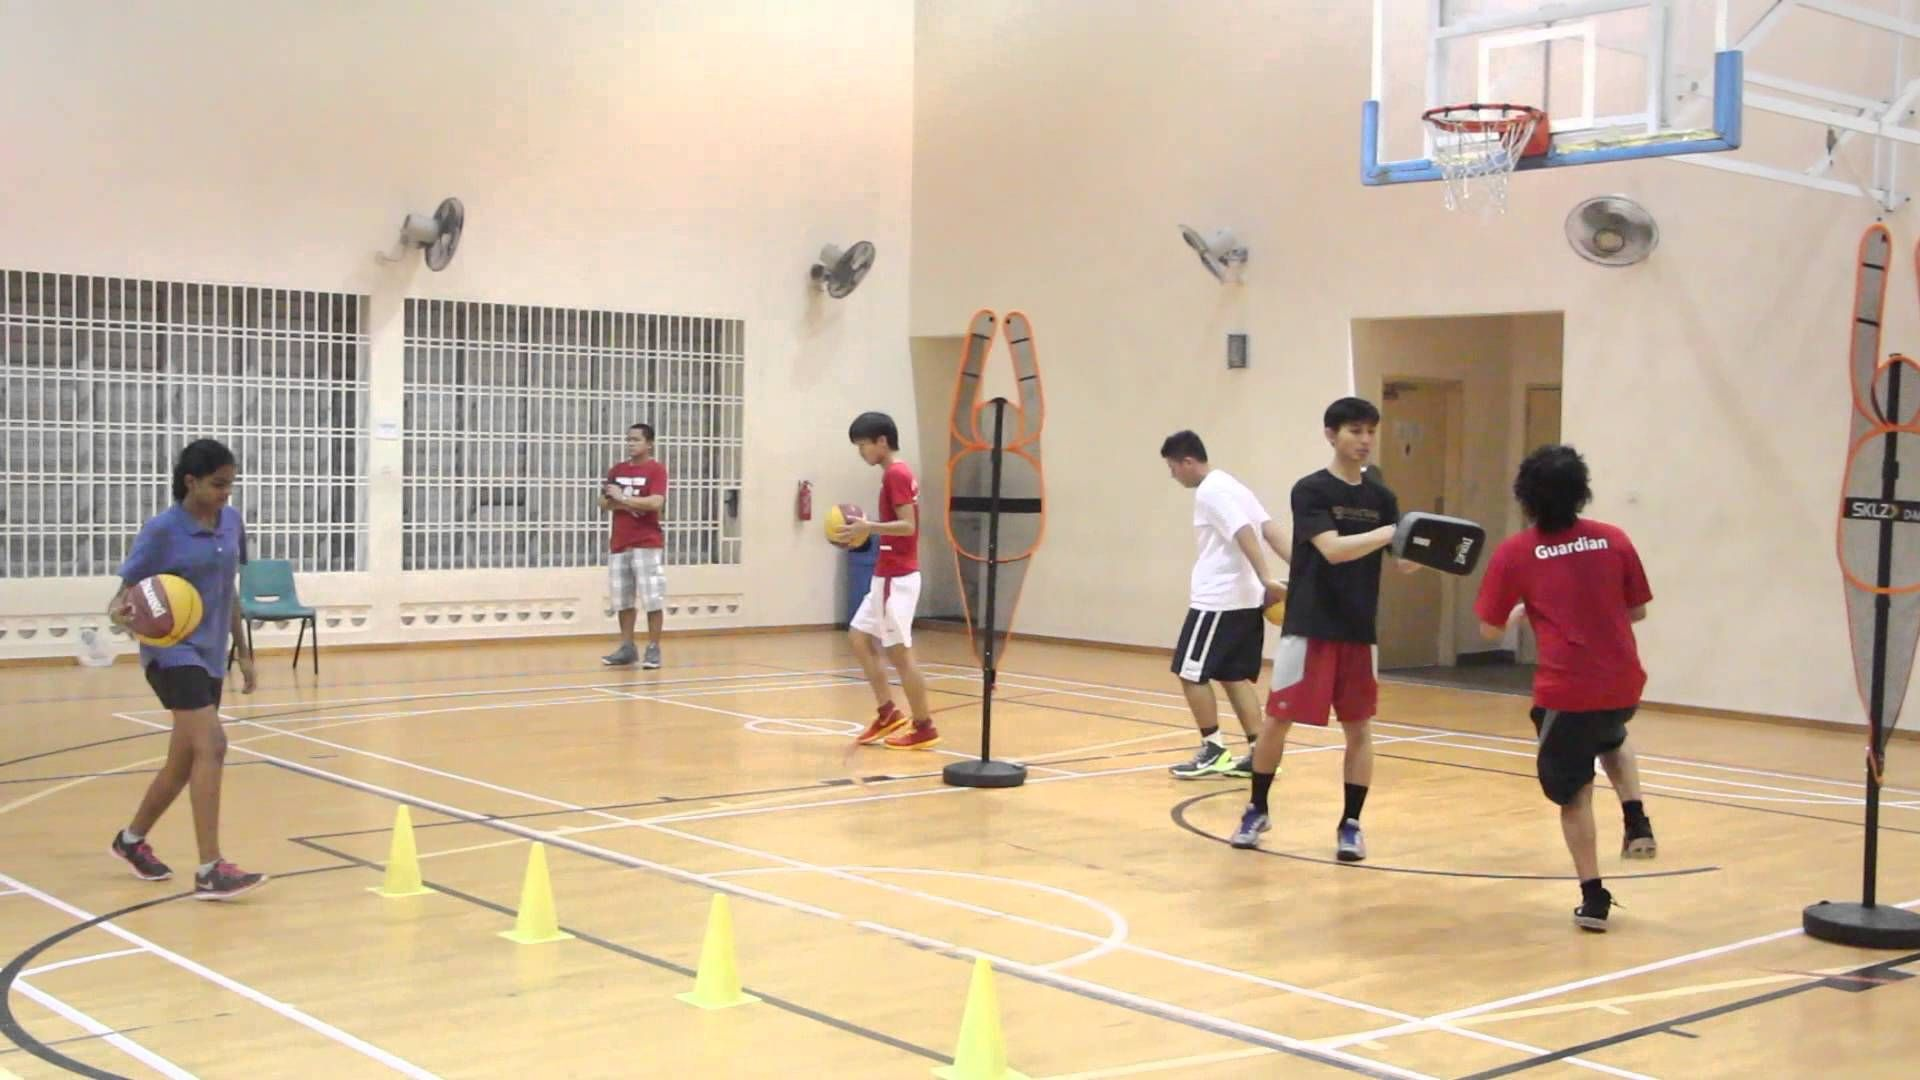 Basketball Training Lesson Singapore Basketball Academy Startyoung Sgbasketball Singaporebasketball Sgbba Basketball Training Basketball Academy Basketball